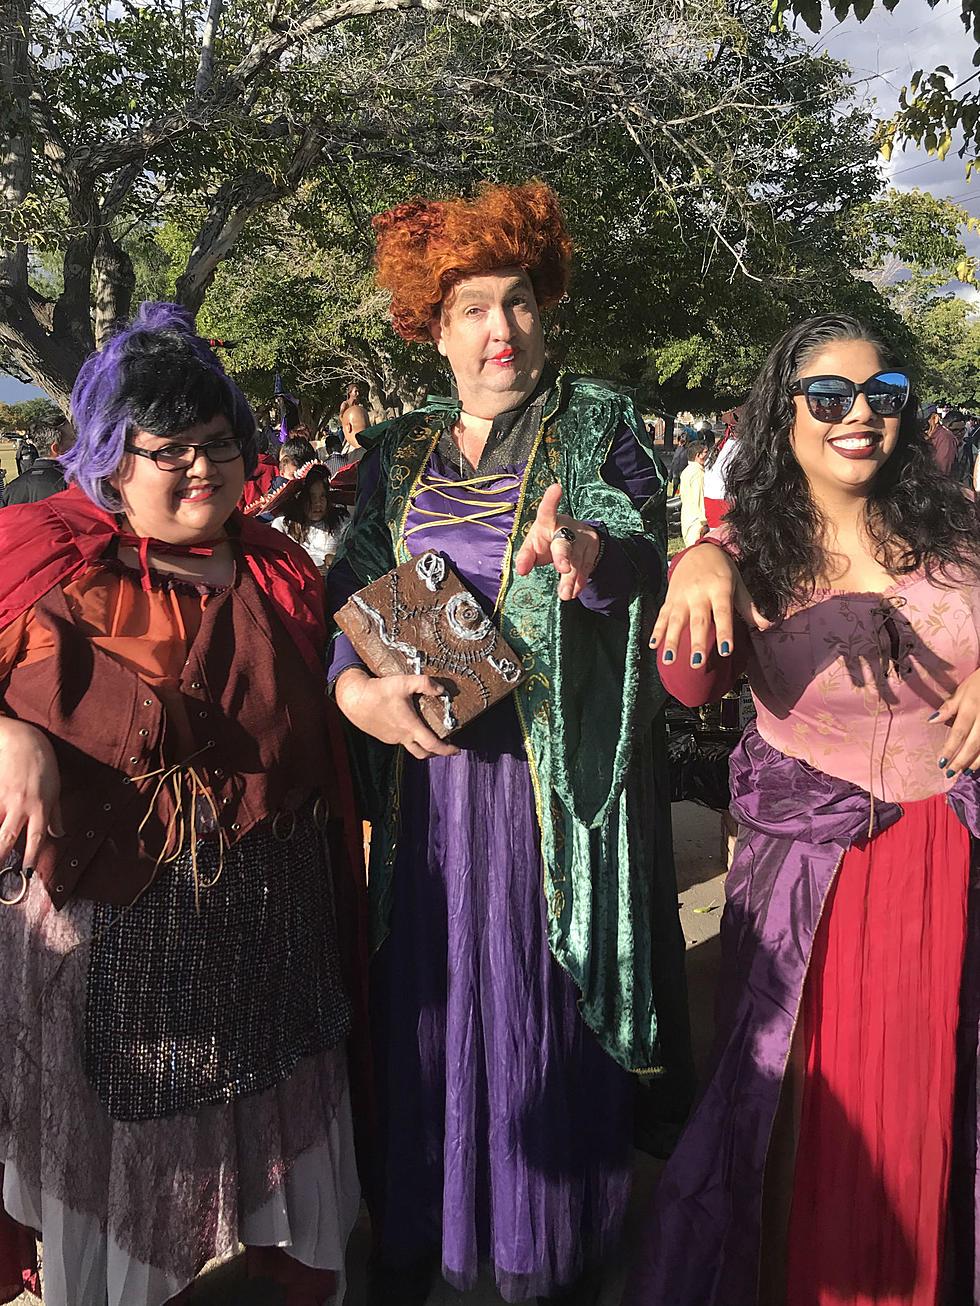 Klaq Halloween Parade 2020 KLAQ Halloween Parade FAQS & Rules